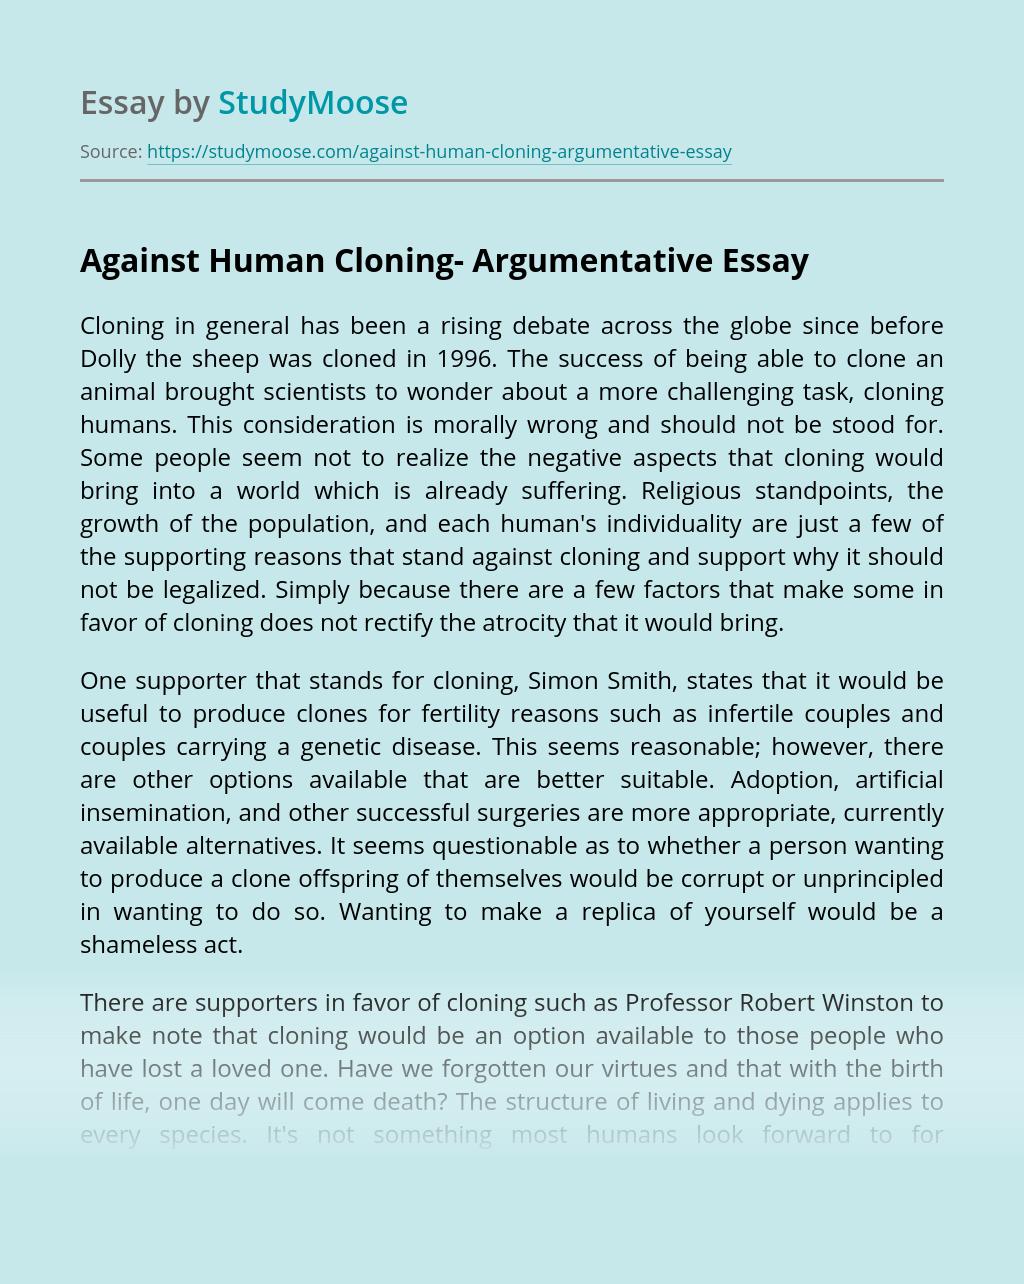 Against Human Cloning- Argumentative